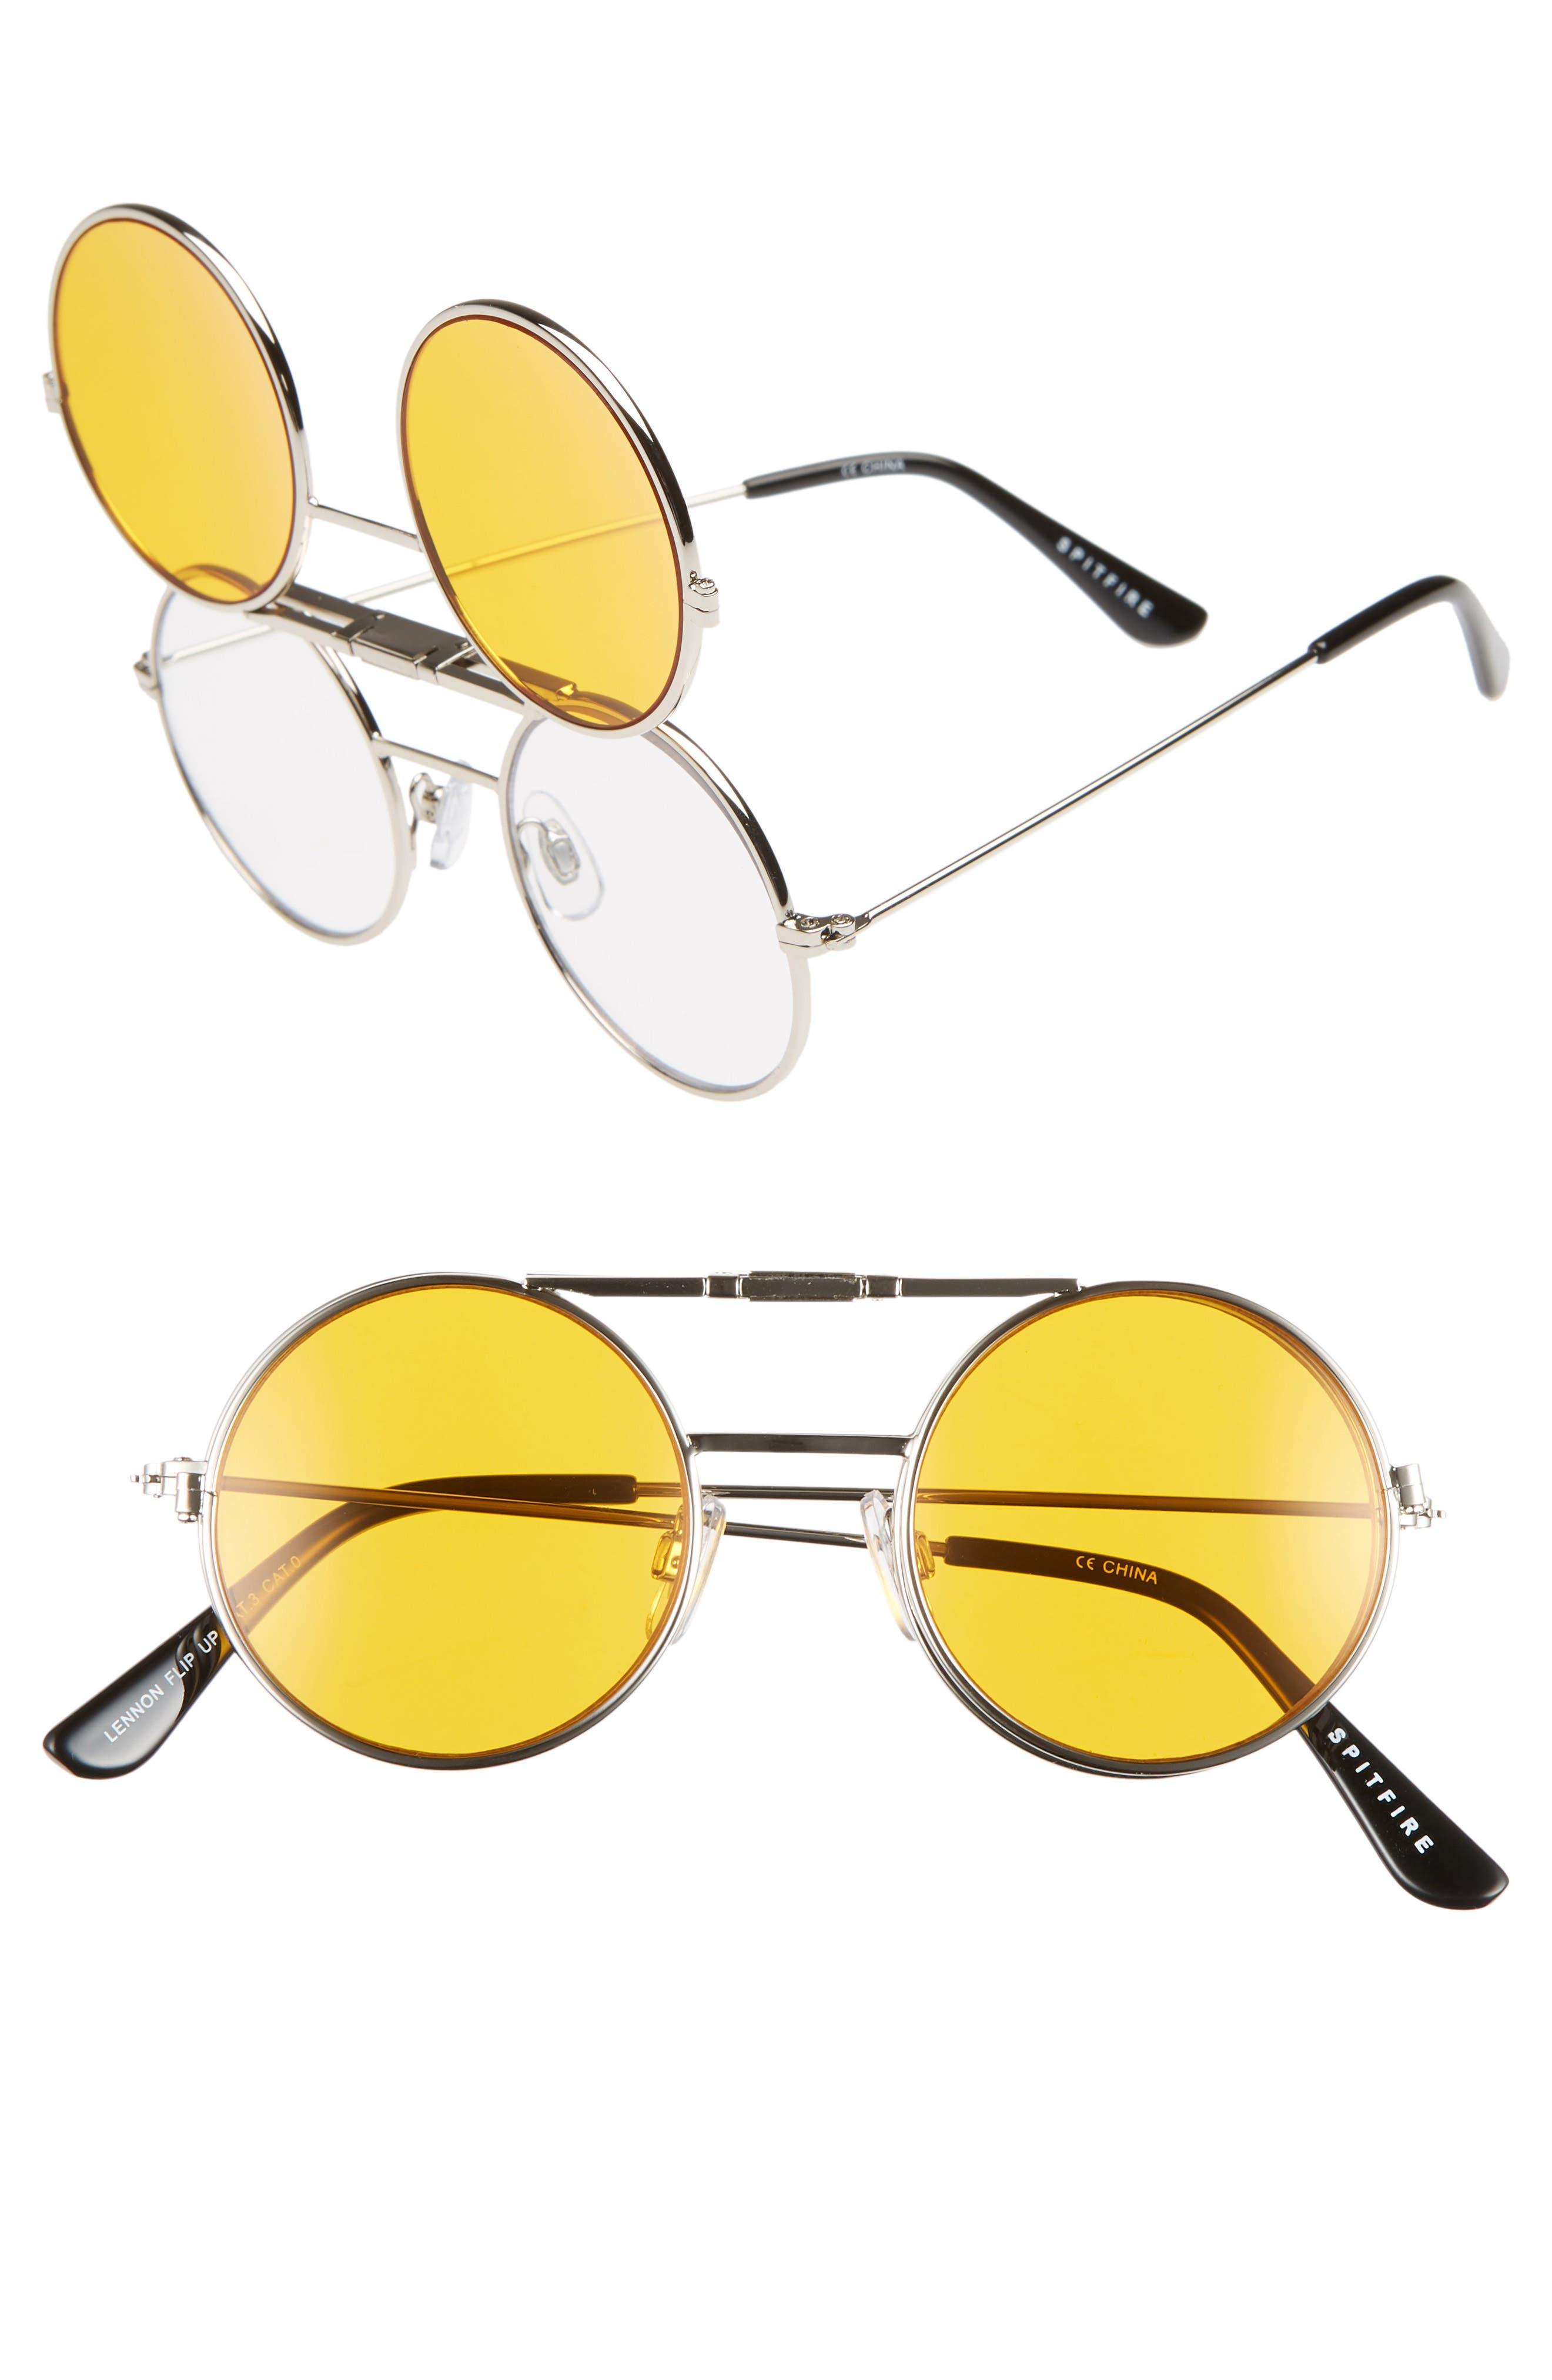 SPITFIRE Lennon Flip 45Mm Round Sunglasses - Silver/ Orange